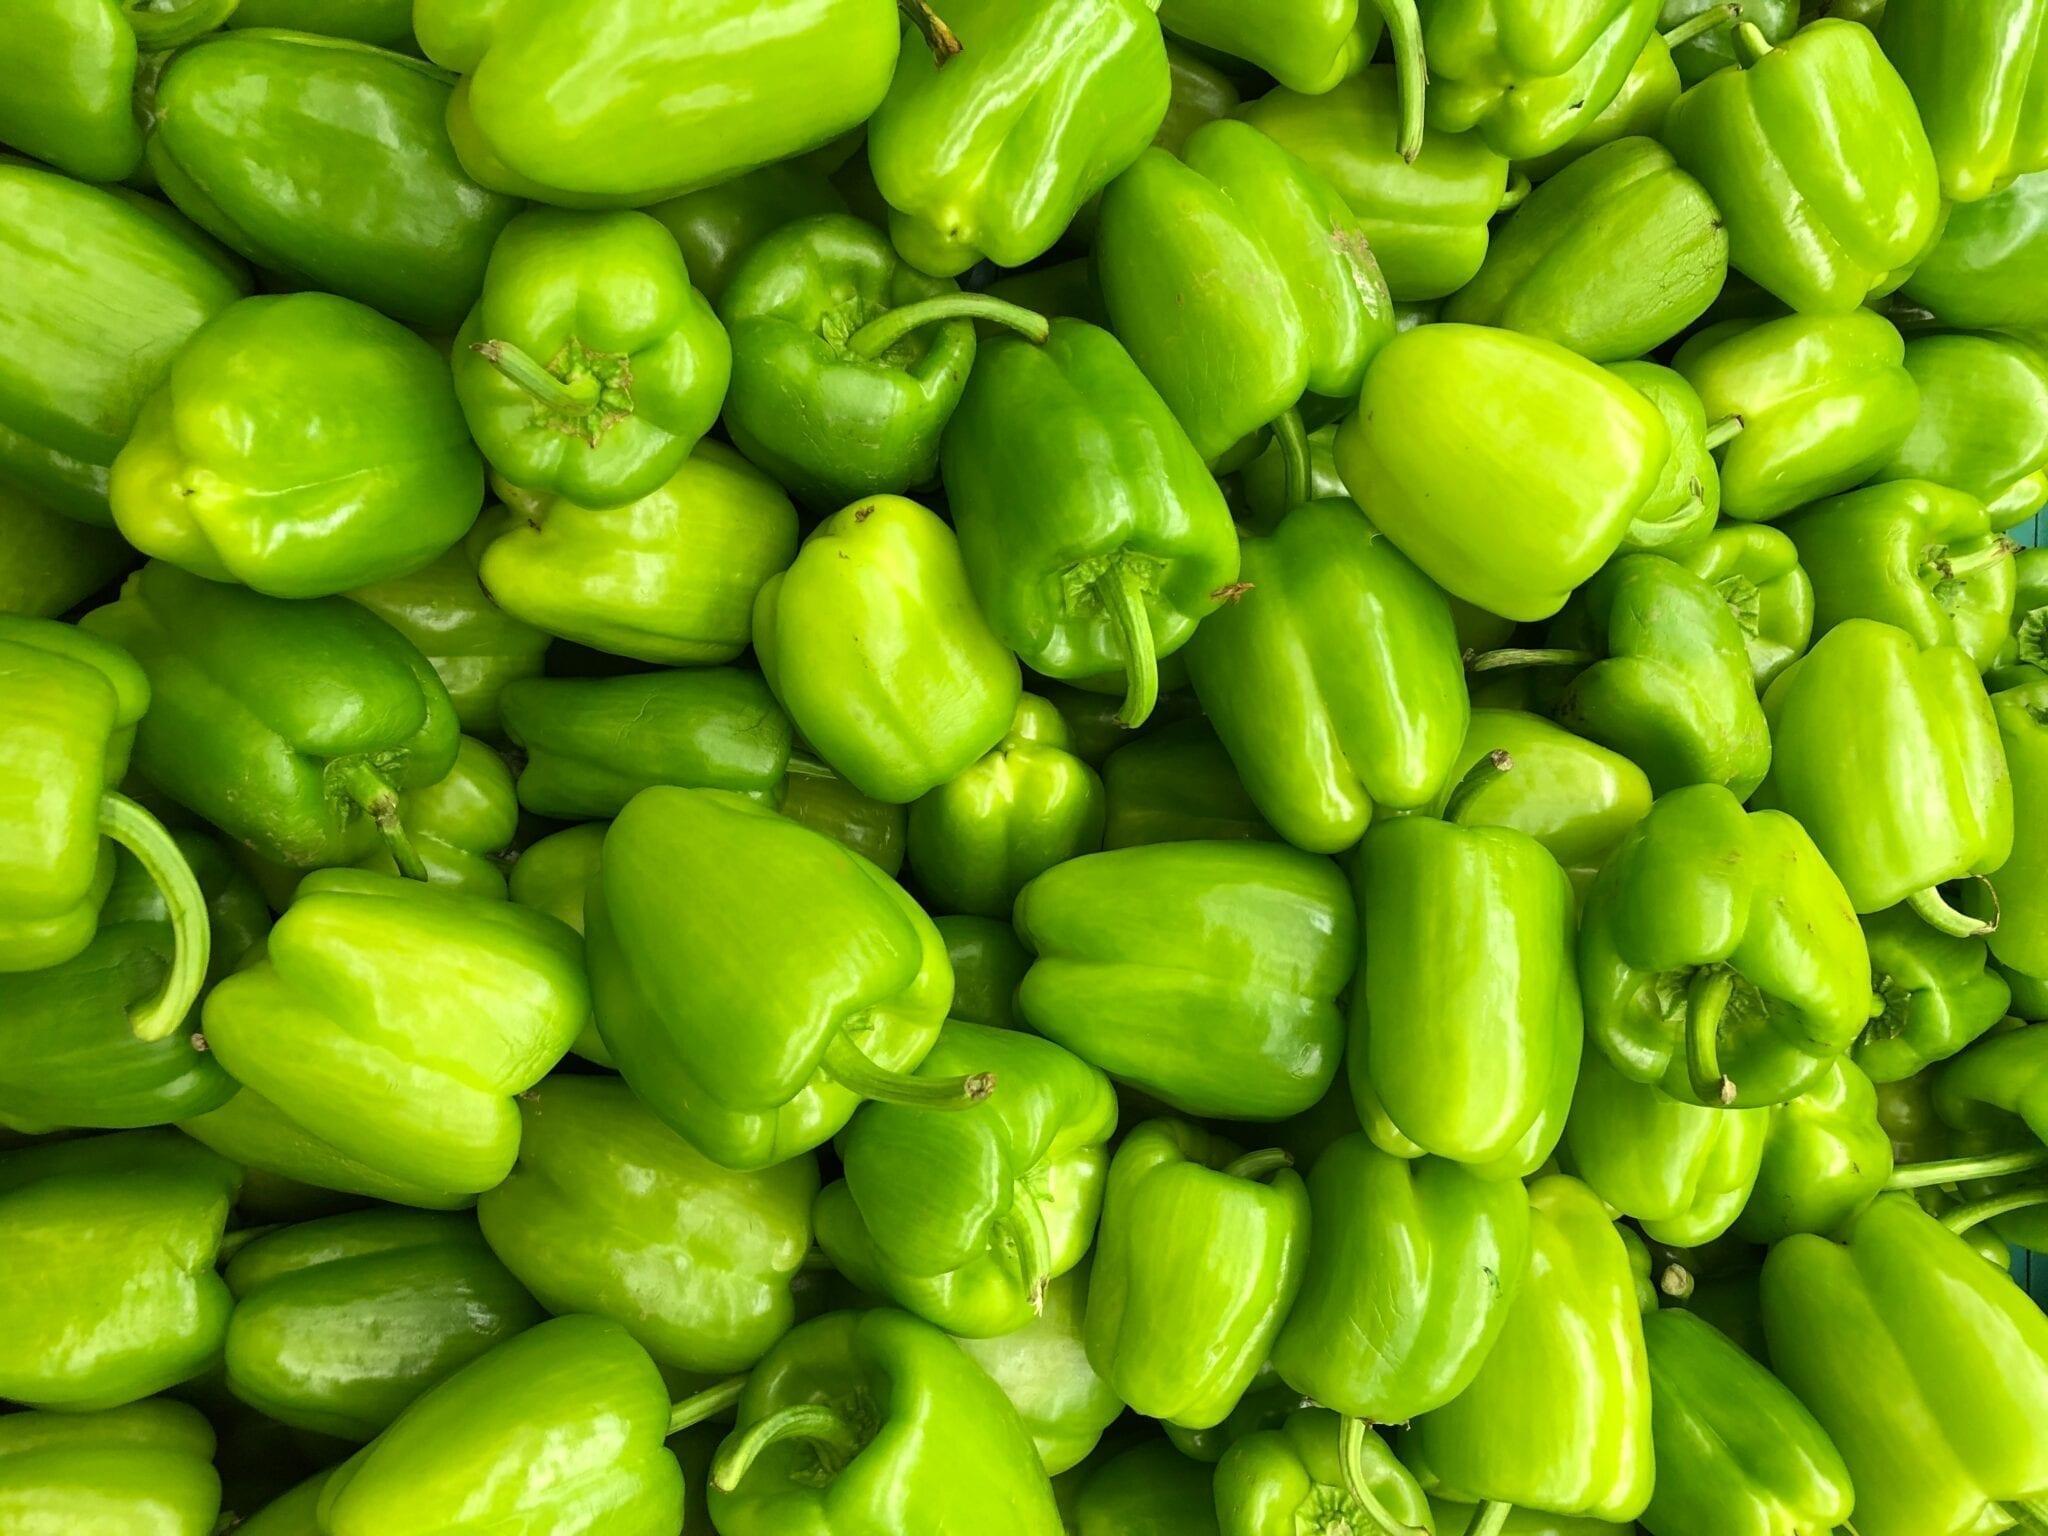 Green bell peppers. Photo by Alli Stefanova, Unsplash